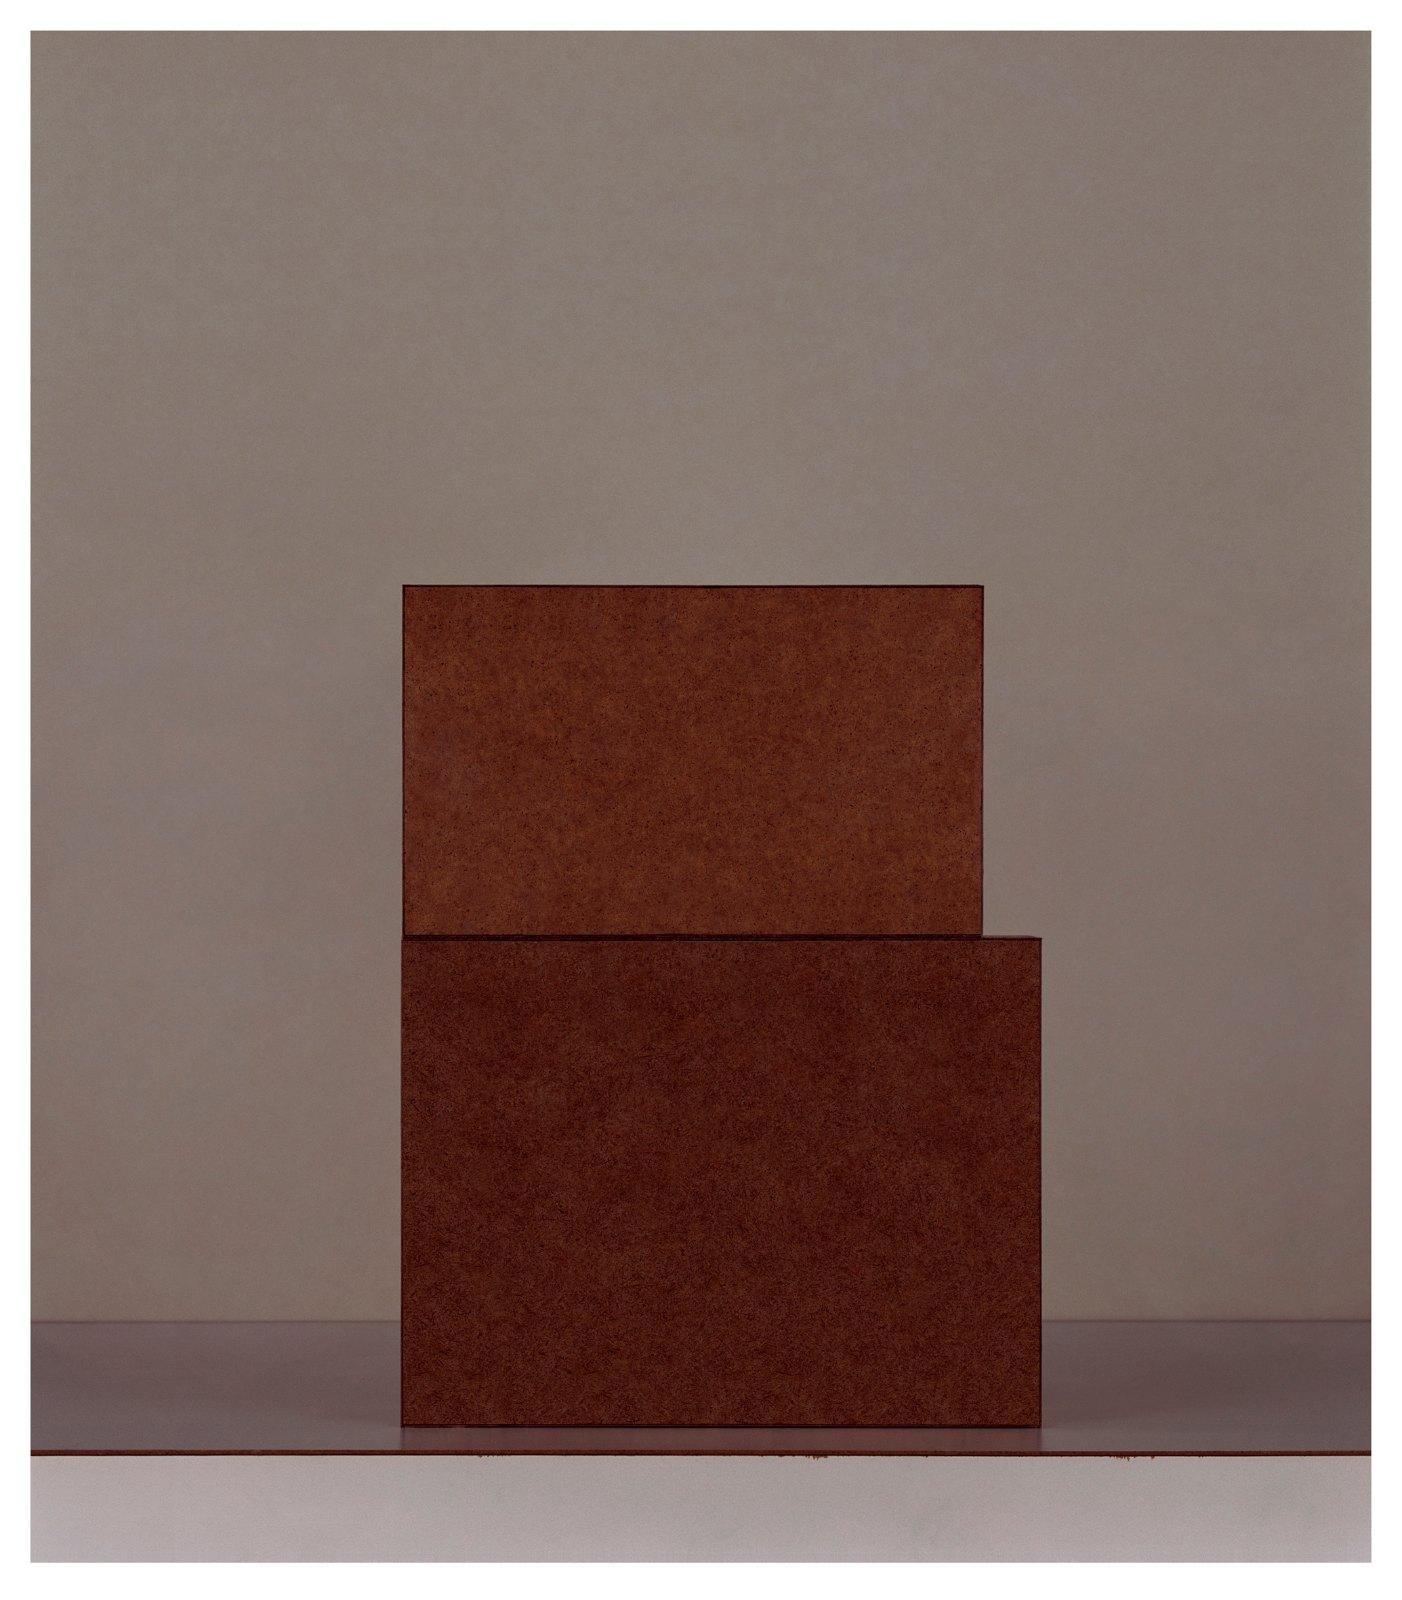 Austiére IV, 2012, Giclée print on Wandflies on aluminium, 91 x 79,5 cm